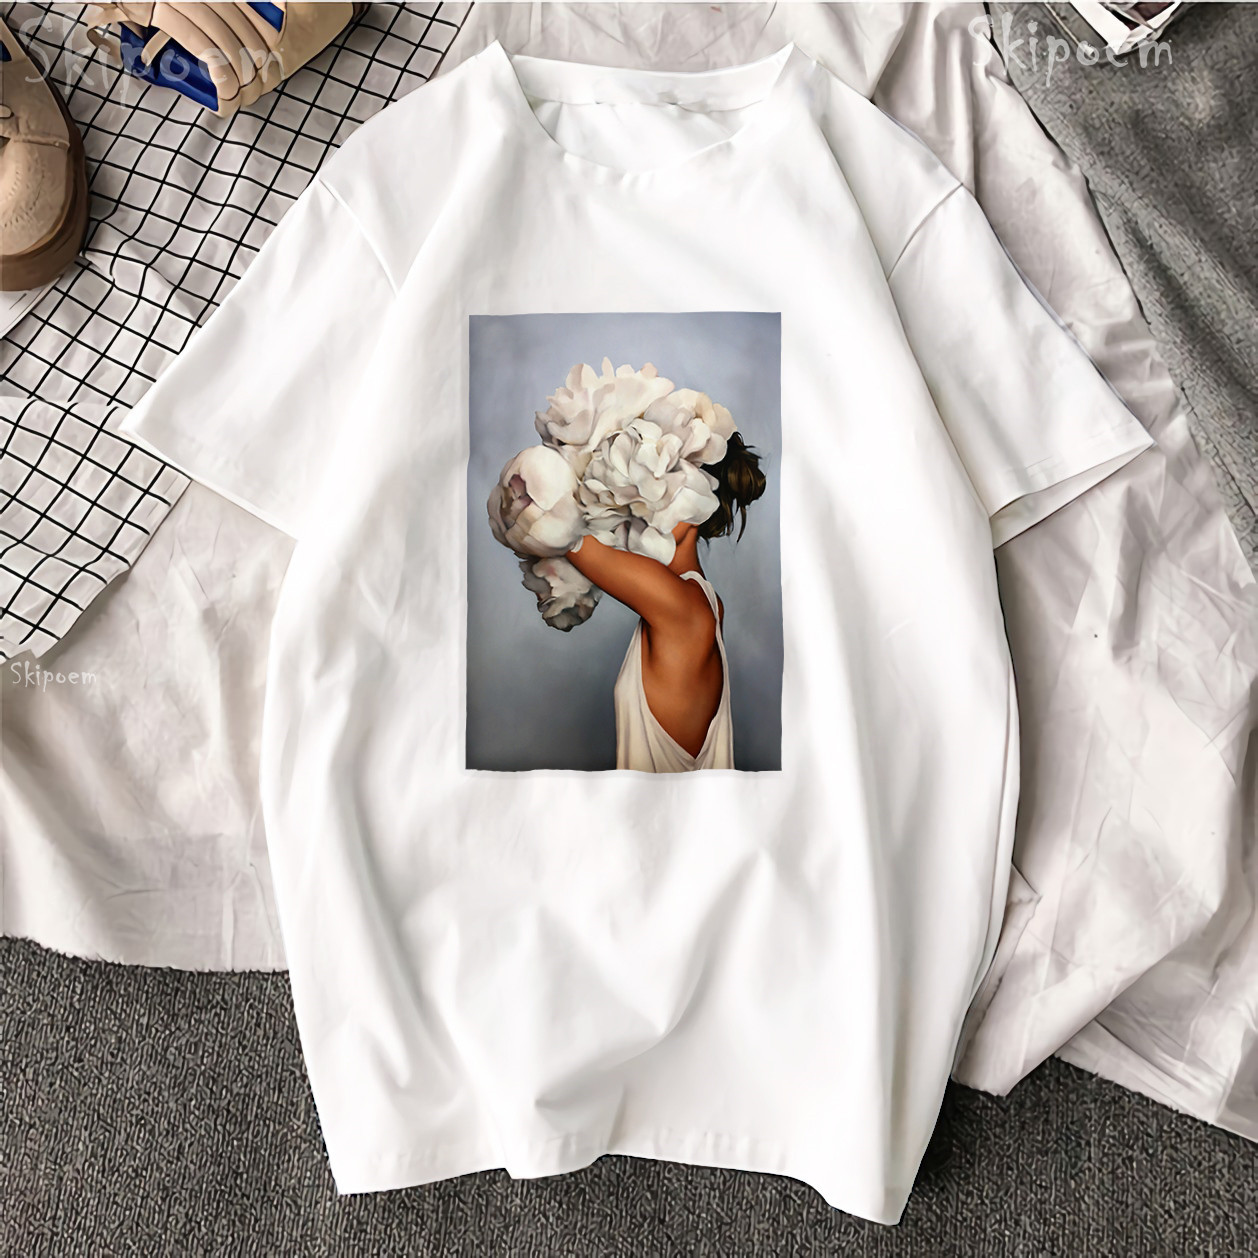 Neue Baumwolle Harajuku Ästhetik T-shirt Sexy Blumen Feder Print Kurzarm Tops & Tees Fashion Casual Paar T Shirt